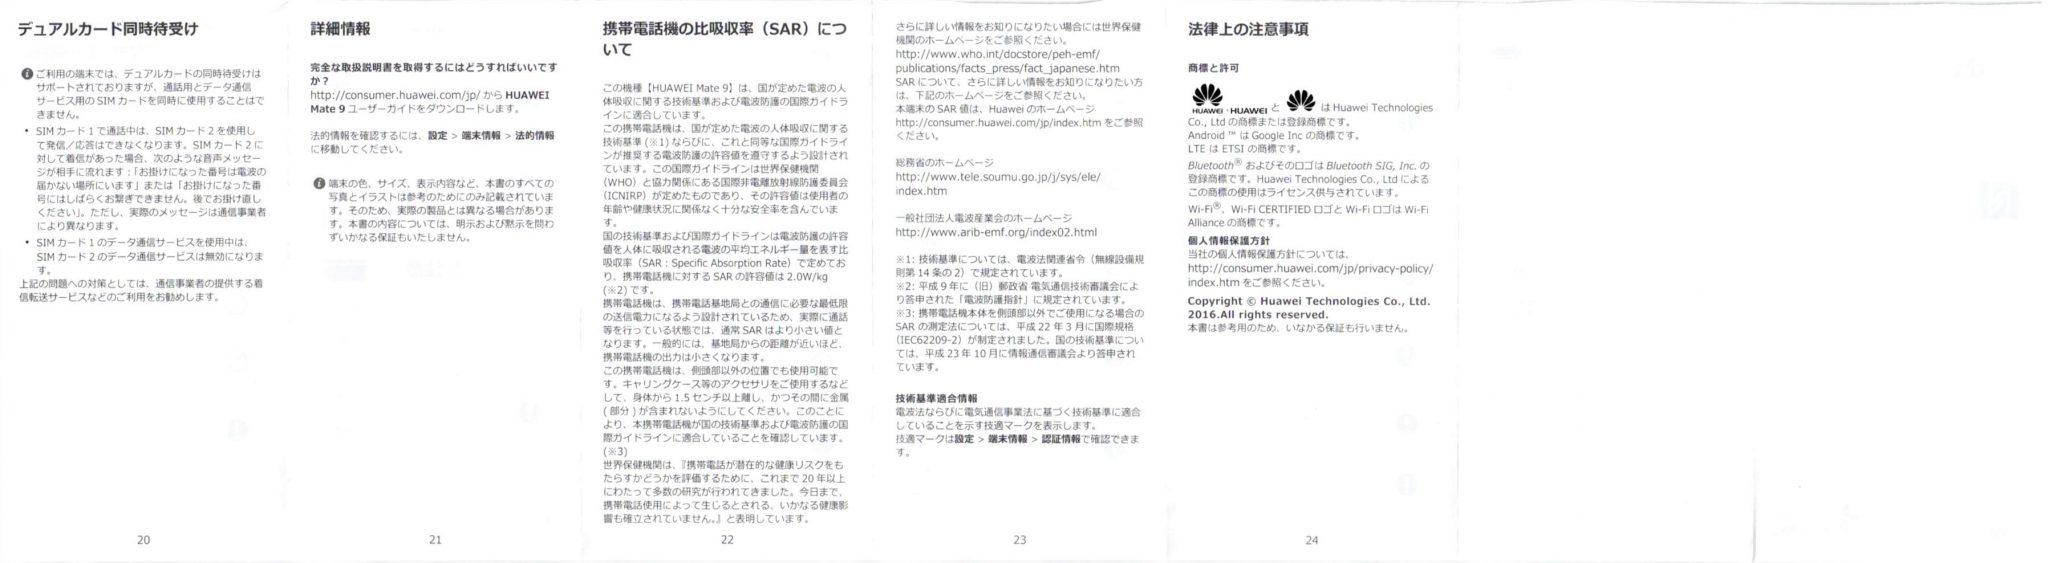 Huawei mate 9 付属品 取説 日本語3